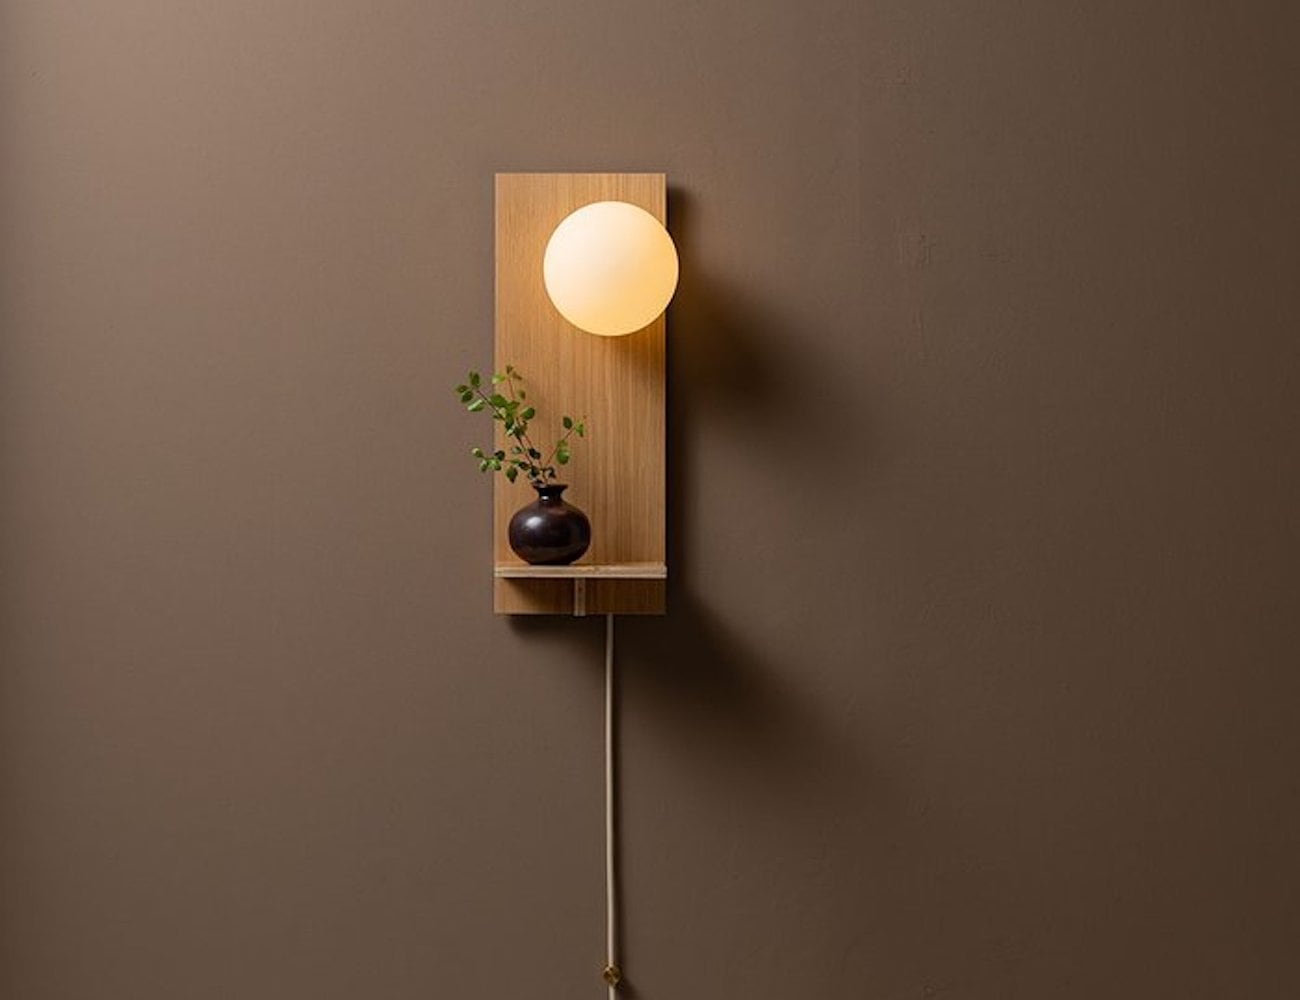 Humanhome Highlight Minimalist Shelf Wall Light is an ideal entryway lamp